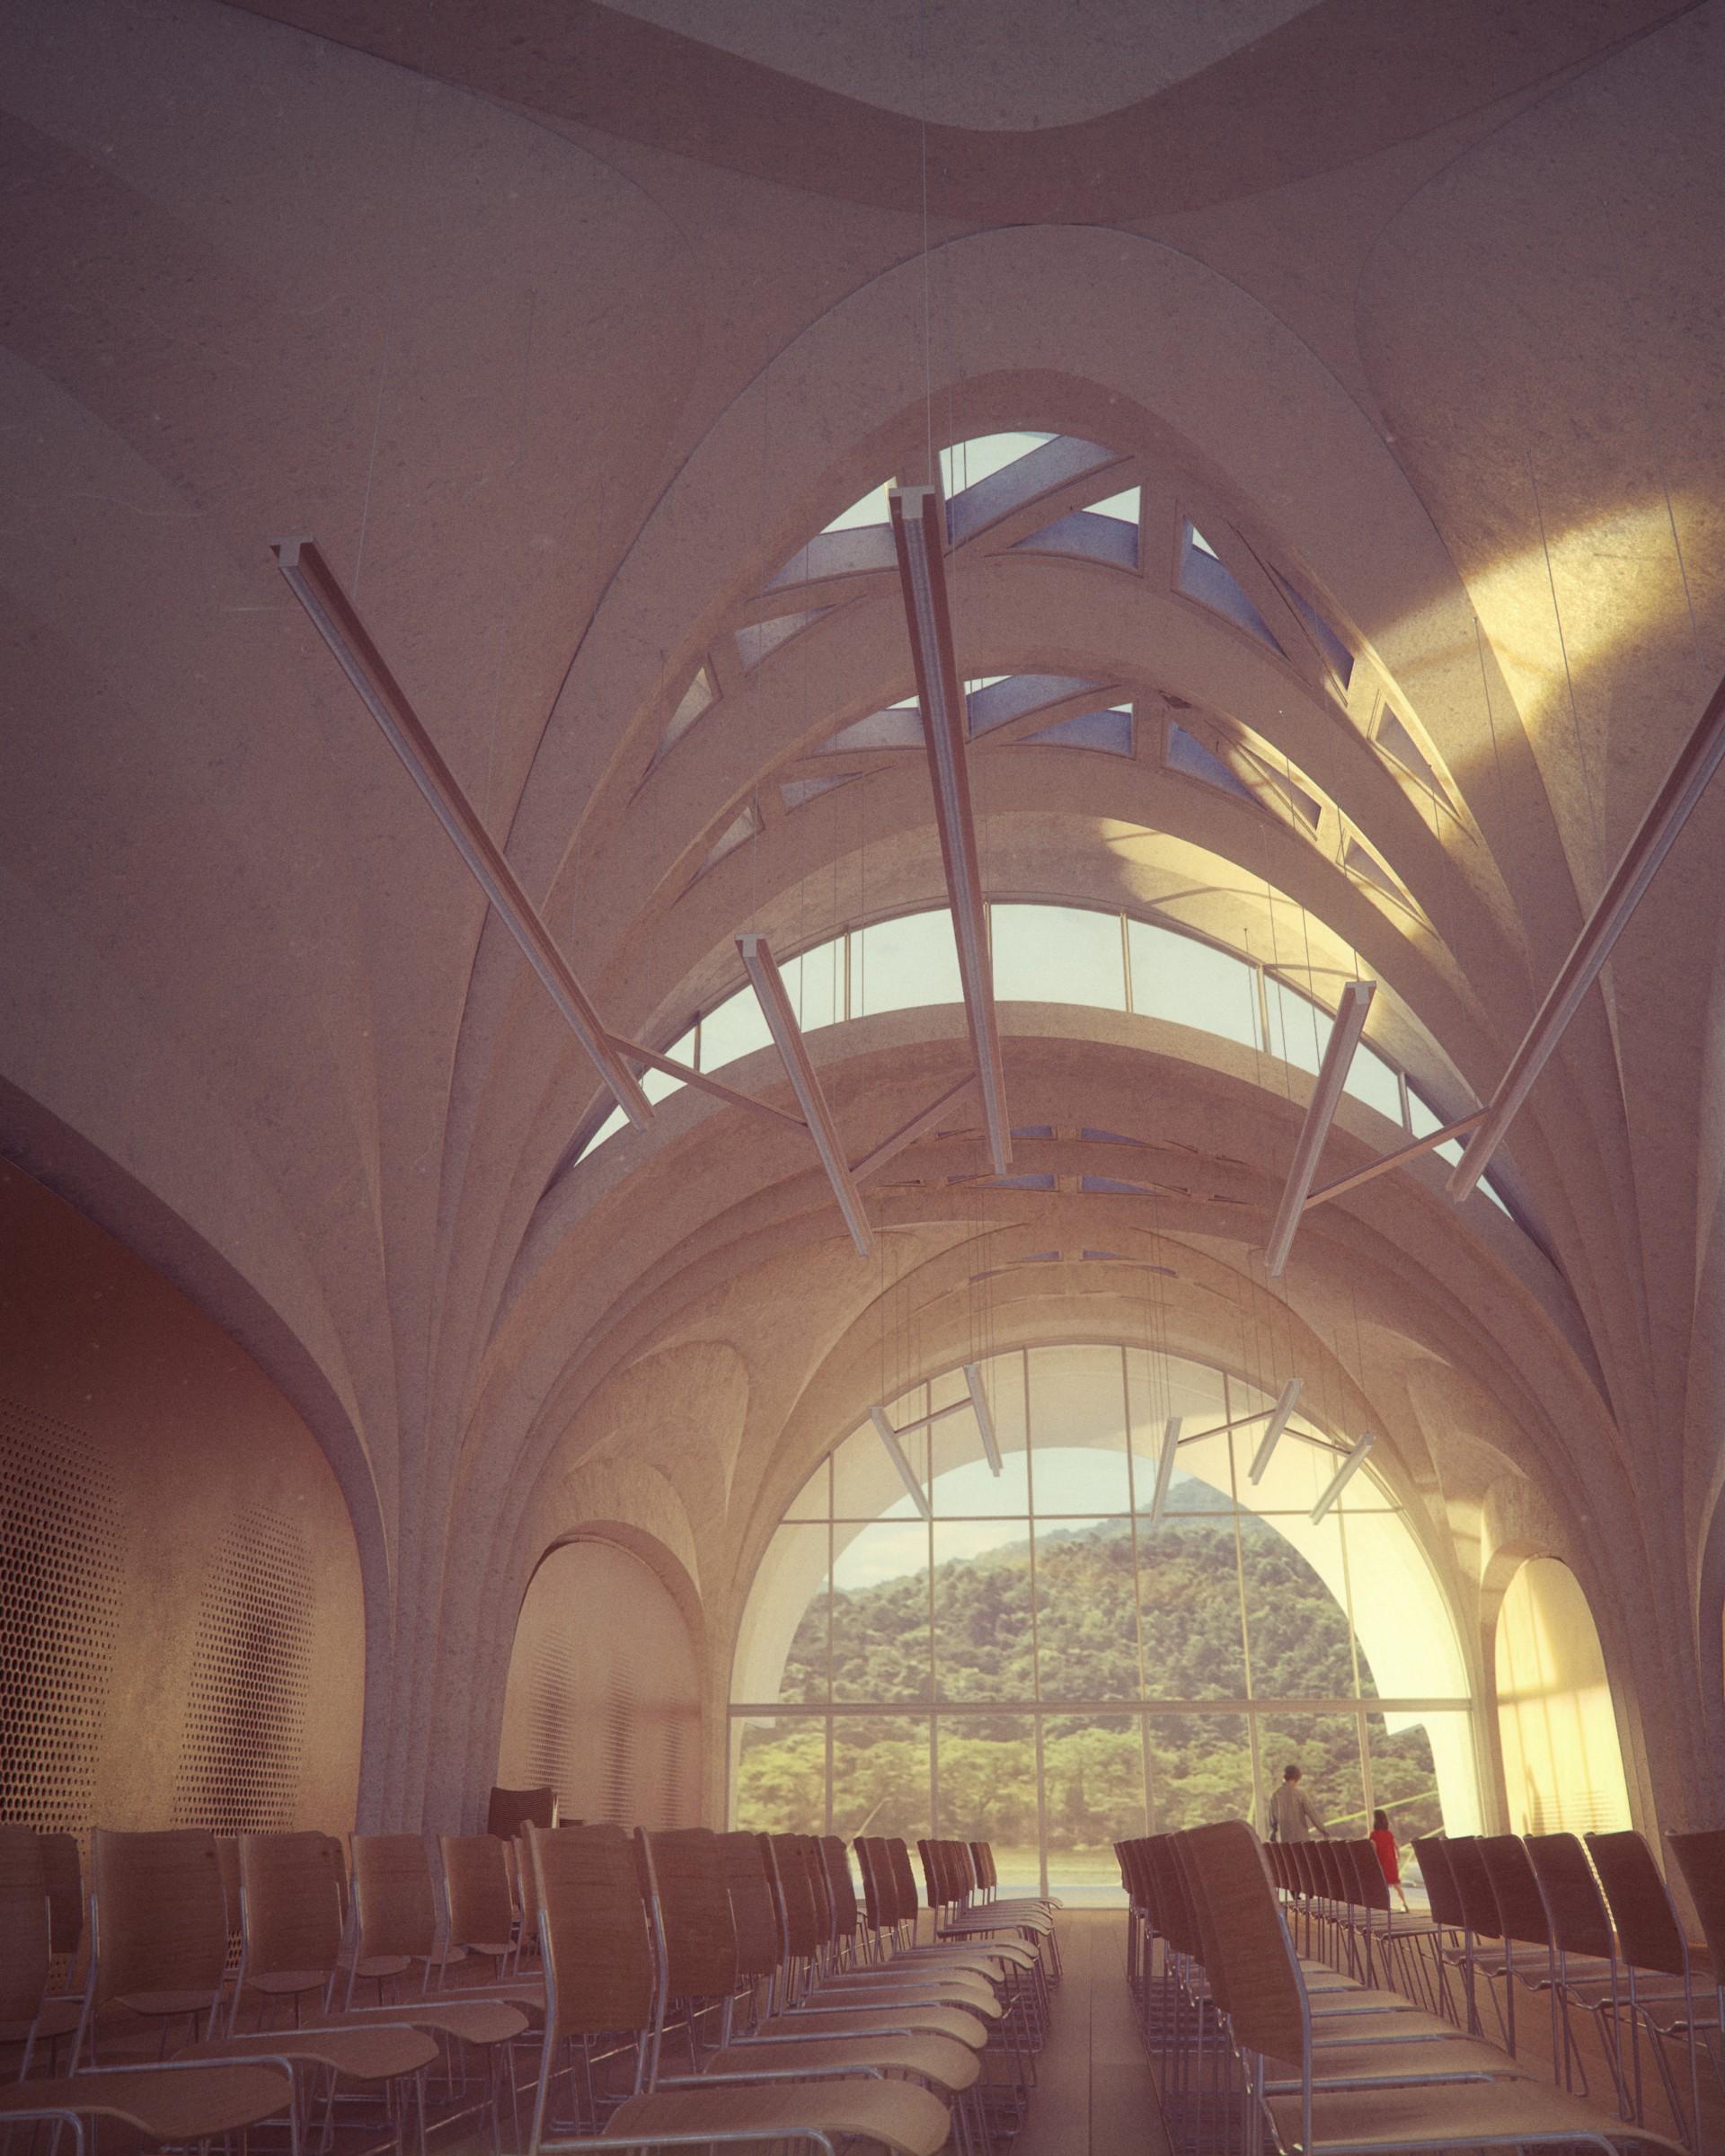 Zaha Hadid Architects Lushan Primary School, from China to Milan